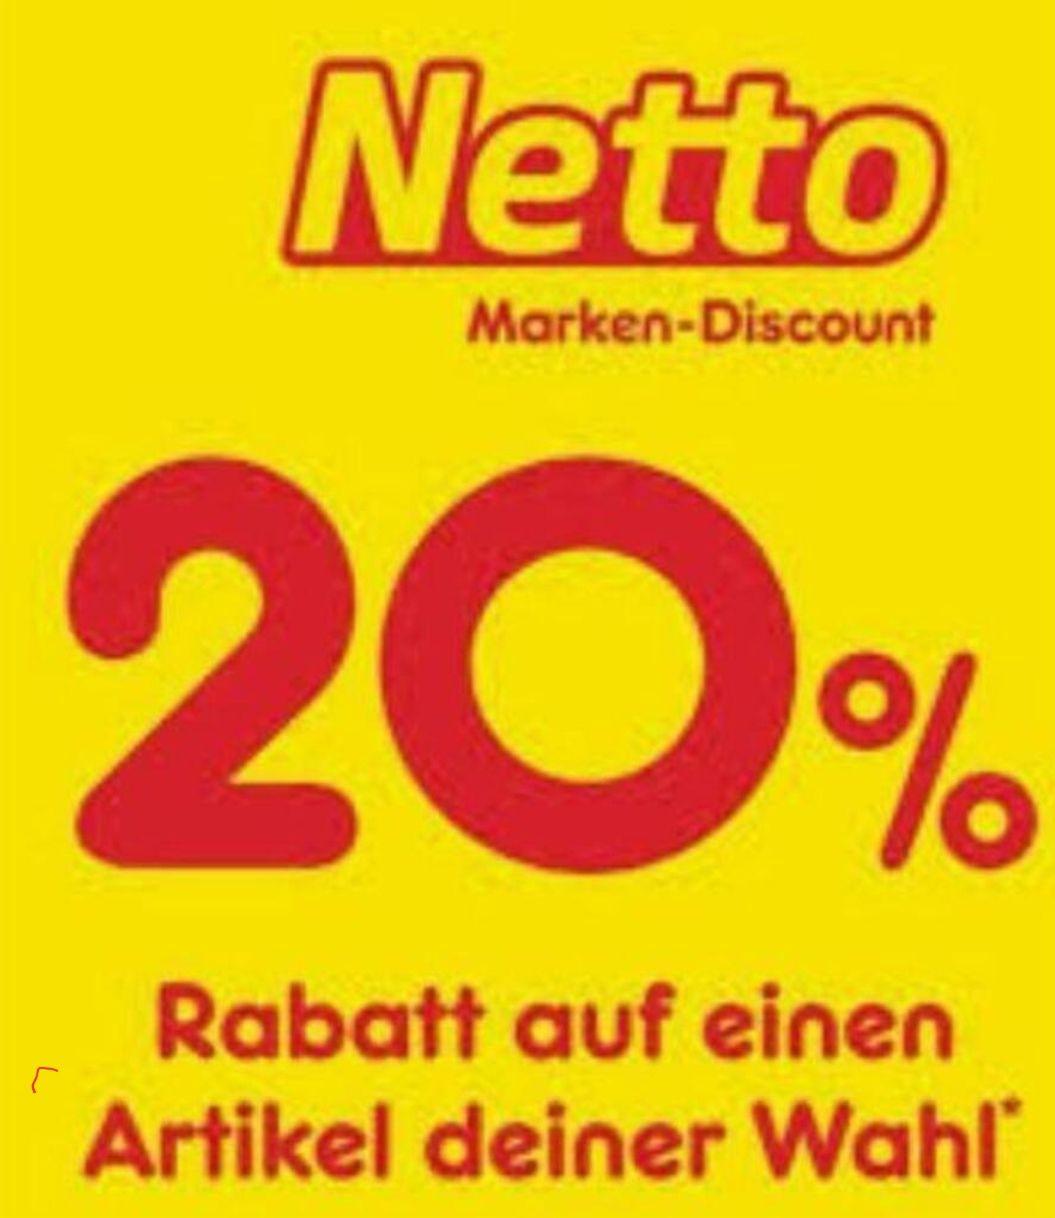 [Netto MD] Rabatt Coupons KW48 (23.11. - 28.11.), bundesweit einsetzbar